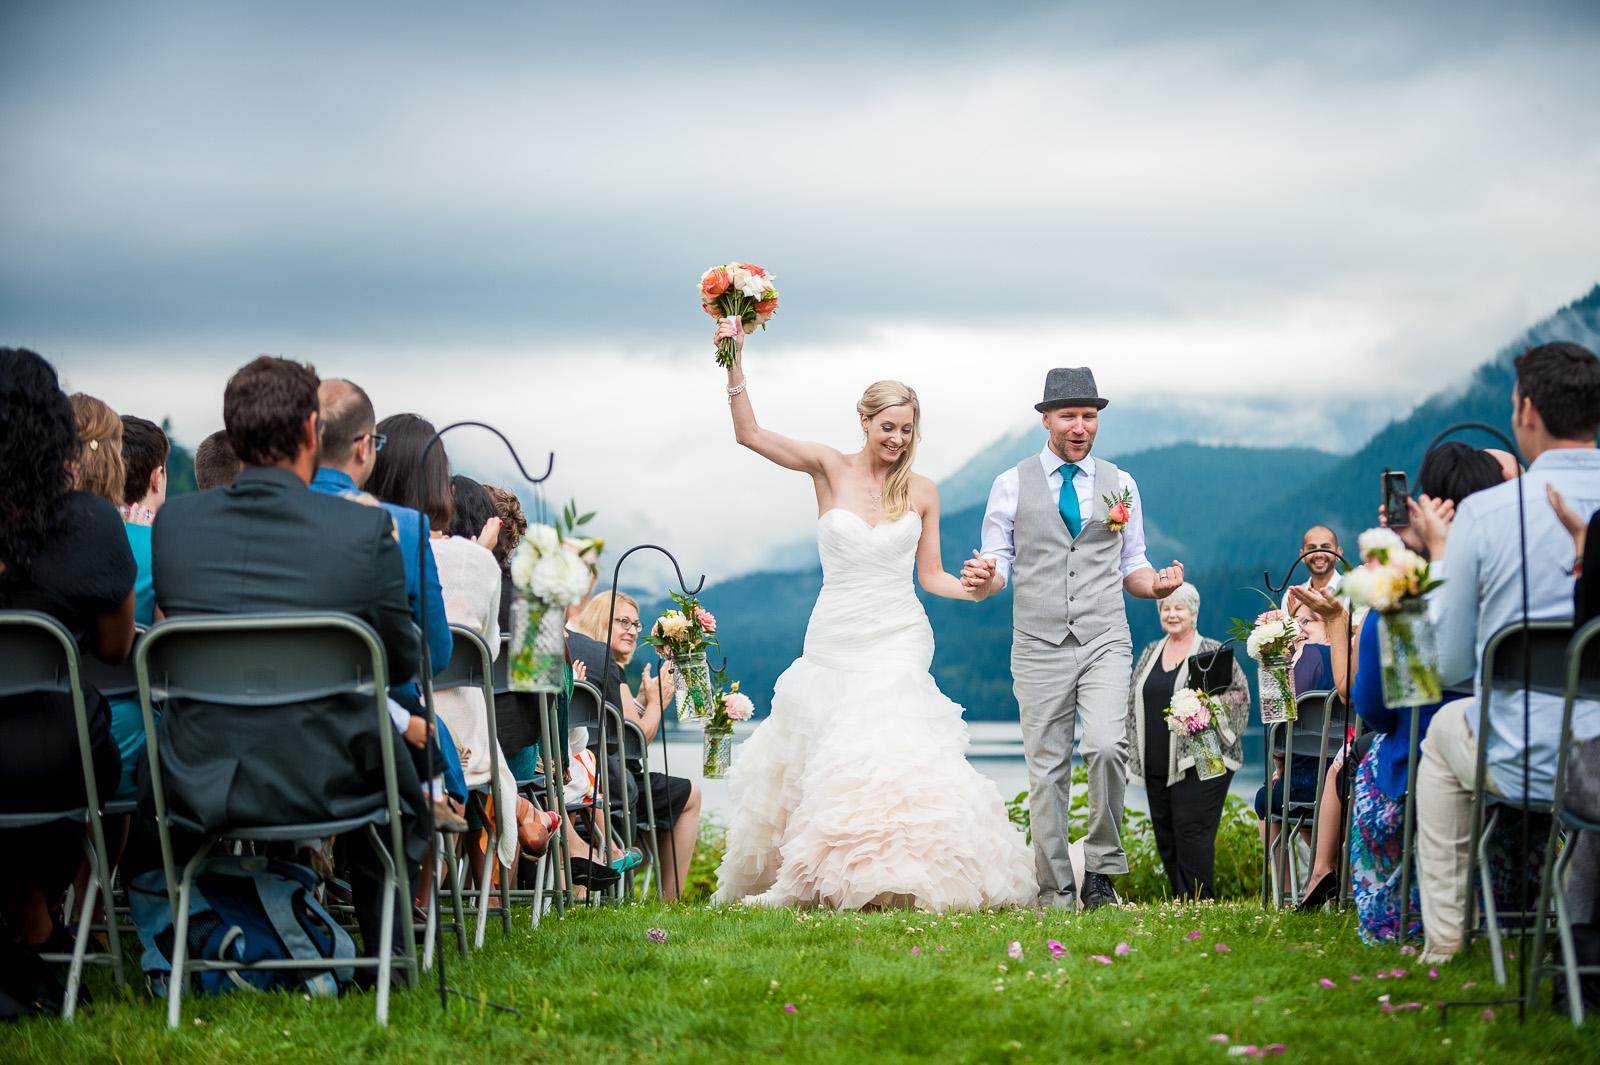 bc-wedding-photographers-cleveland-dam-wedding-12.jpg